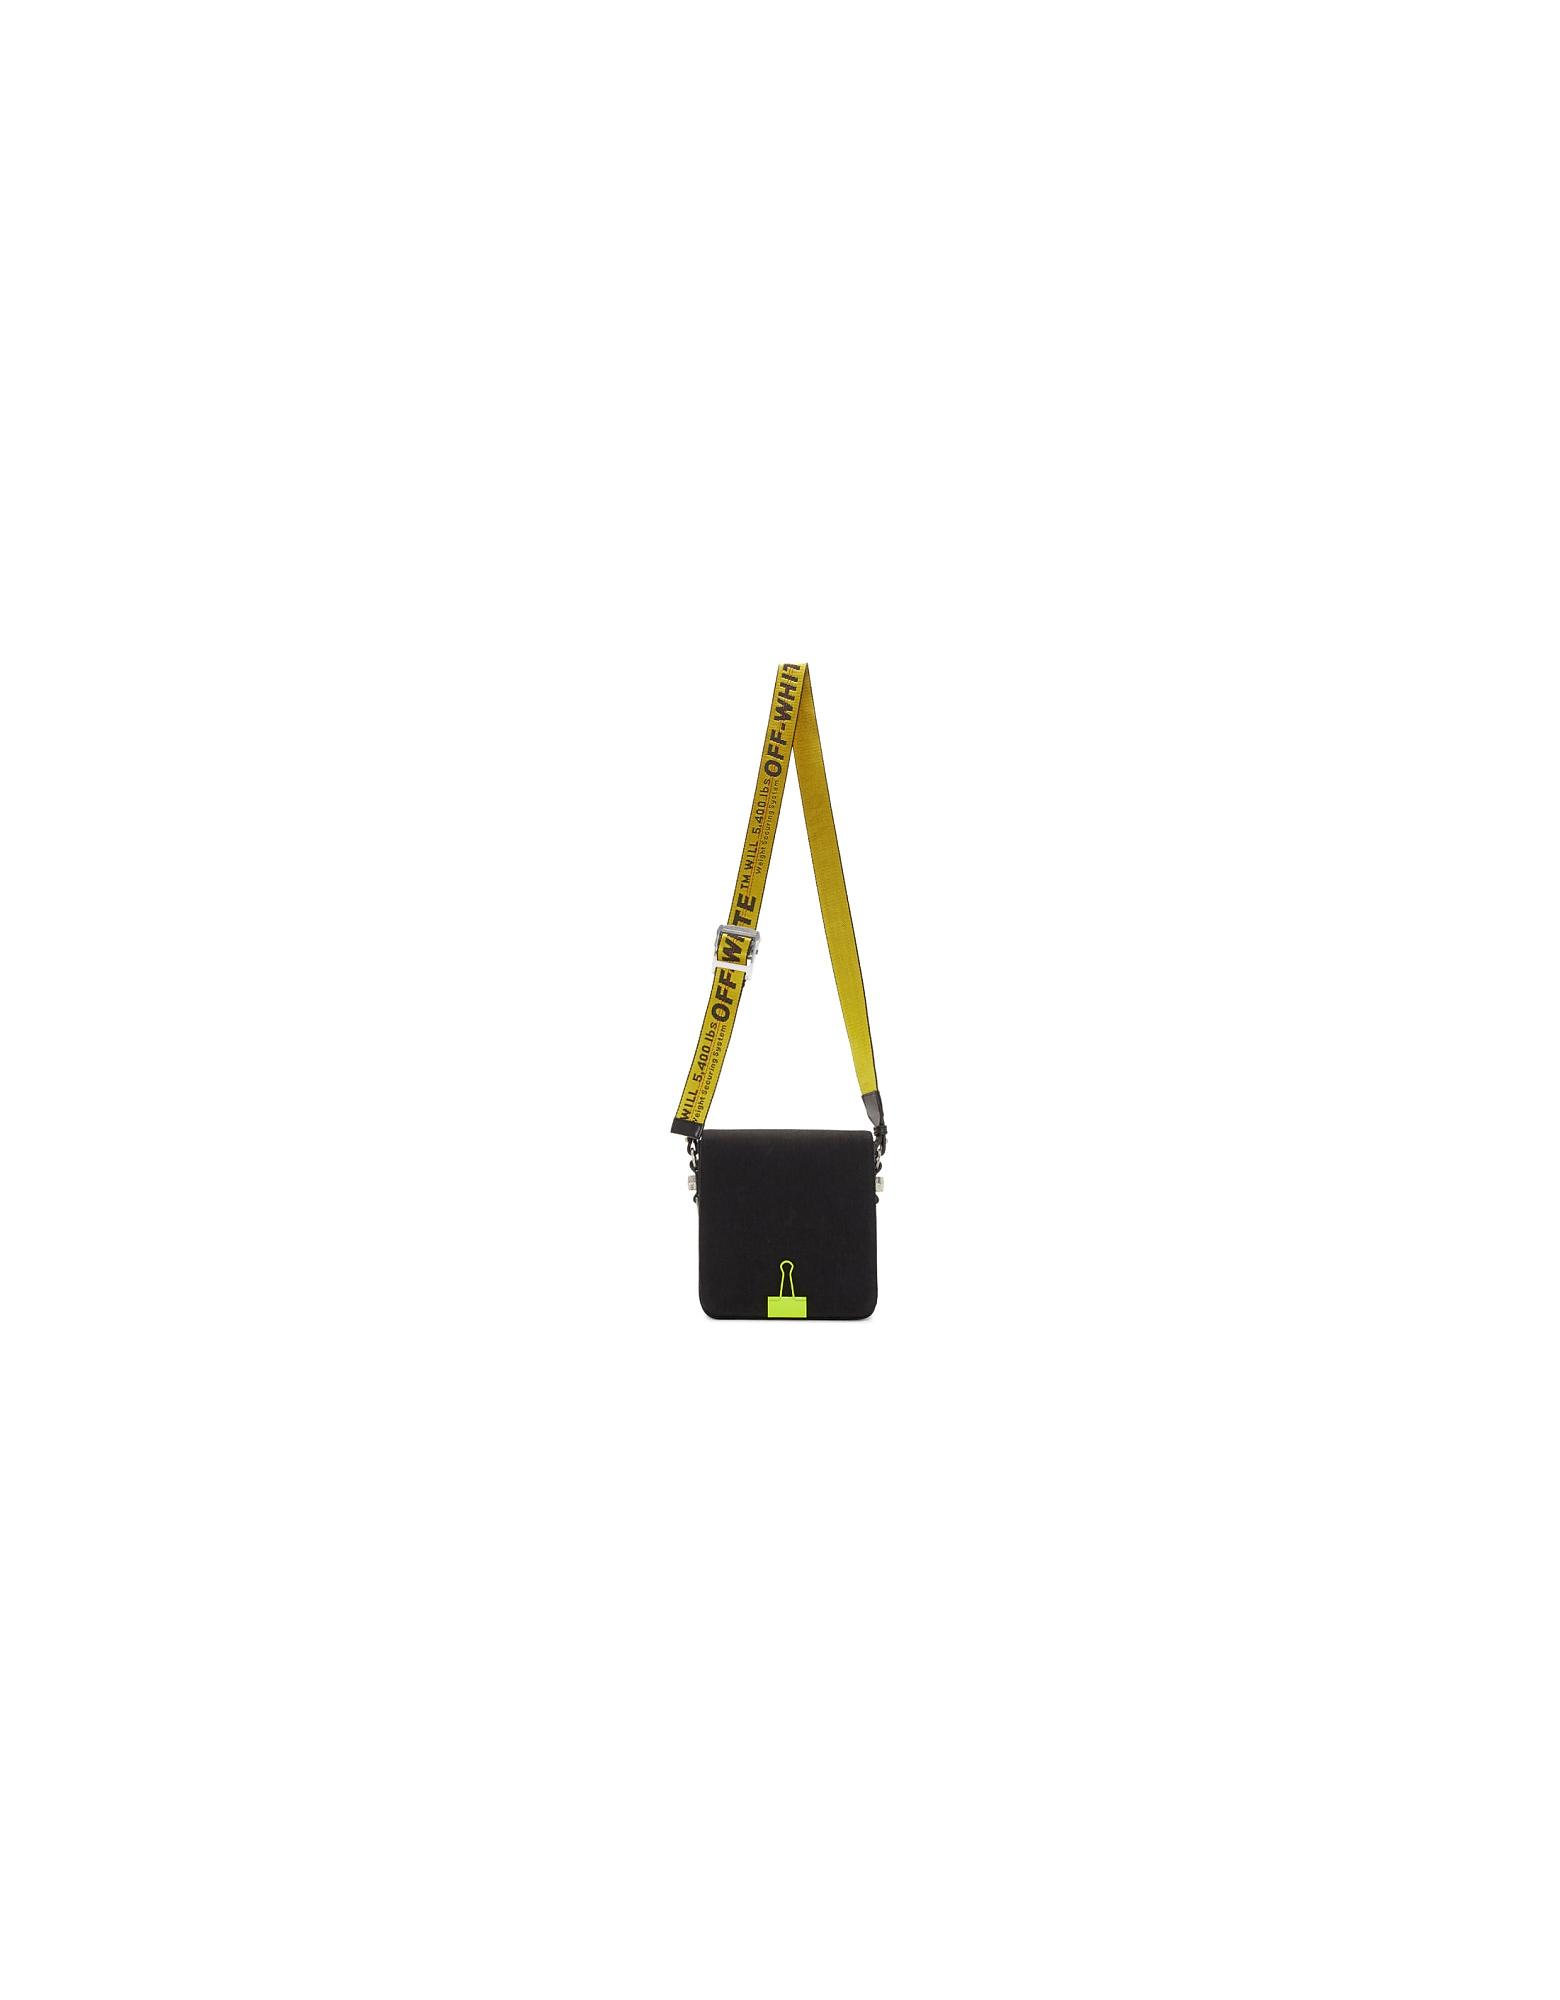 Off-White Designer Handbags, Black and Yellow Binder Clip Bag